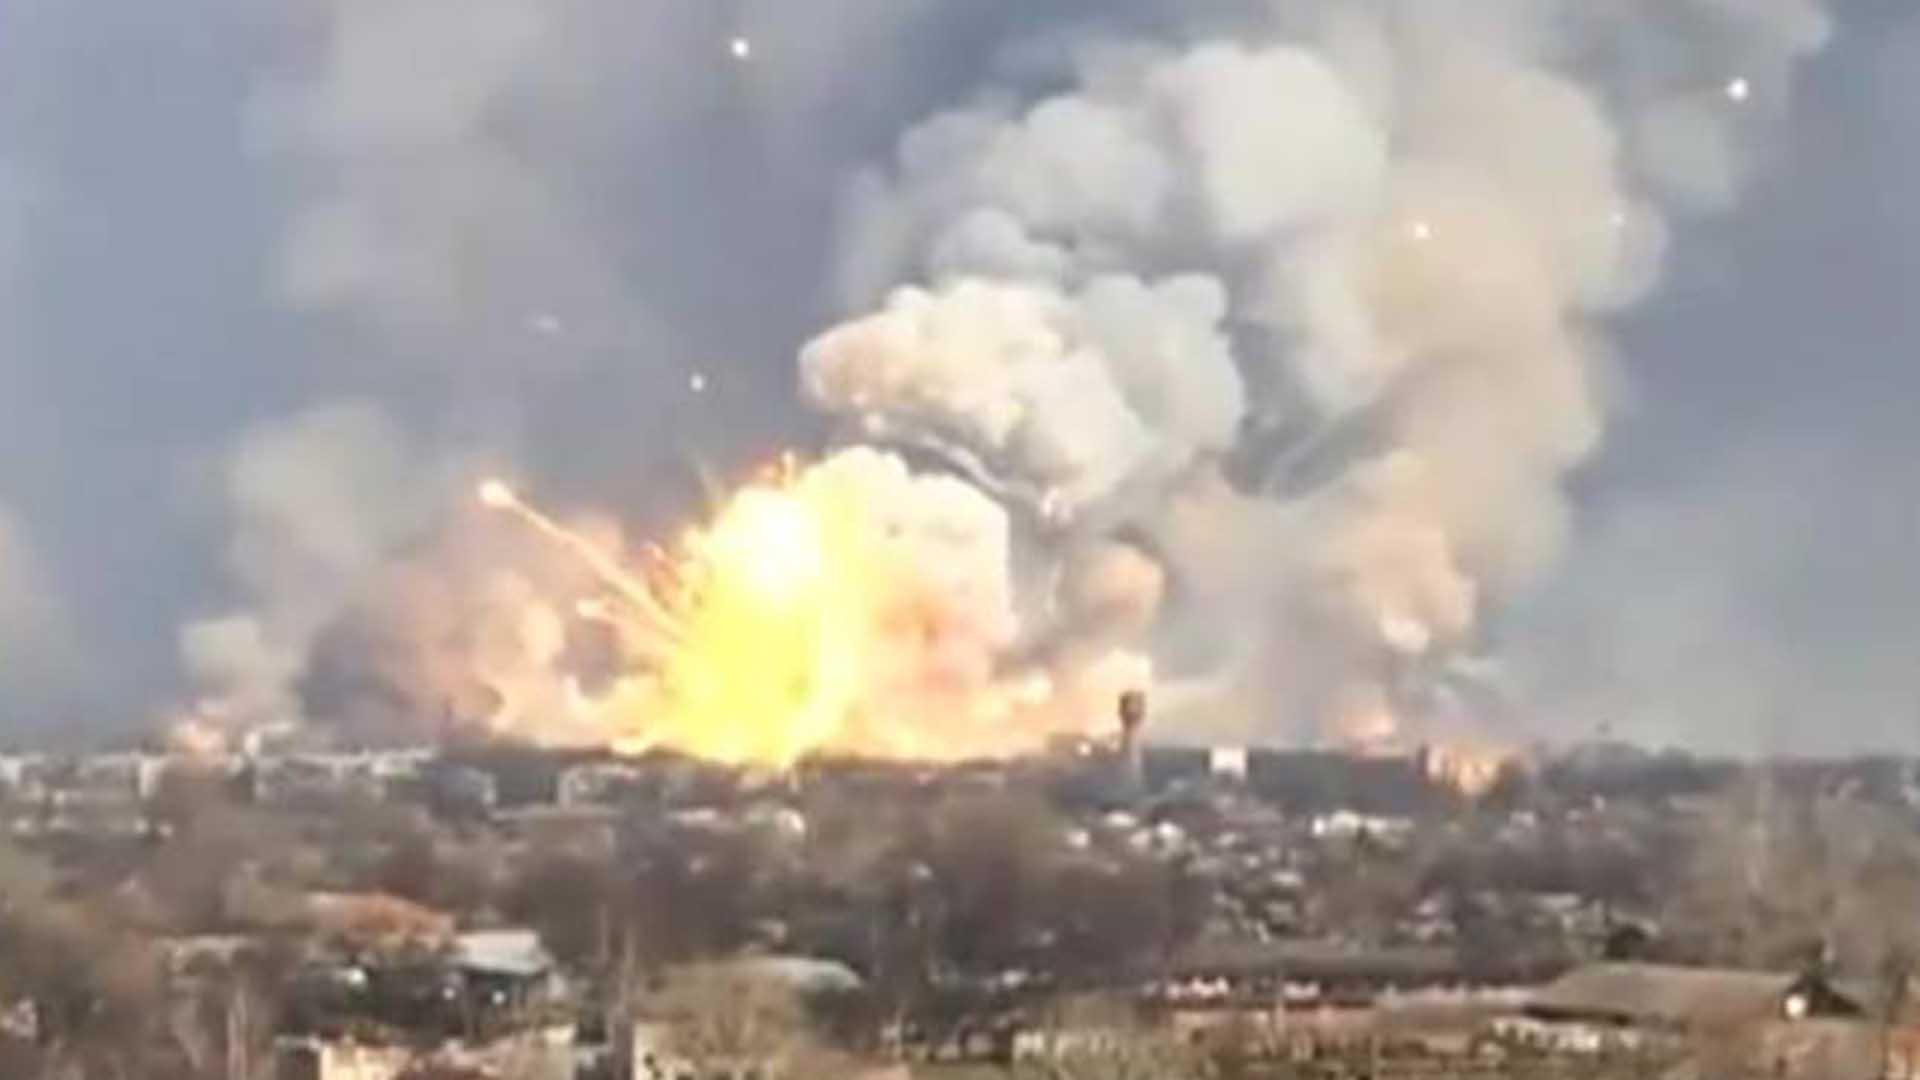 Ukrainian Ammo Depot Explodes Conveniently Amtv 2016 174